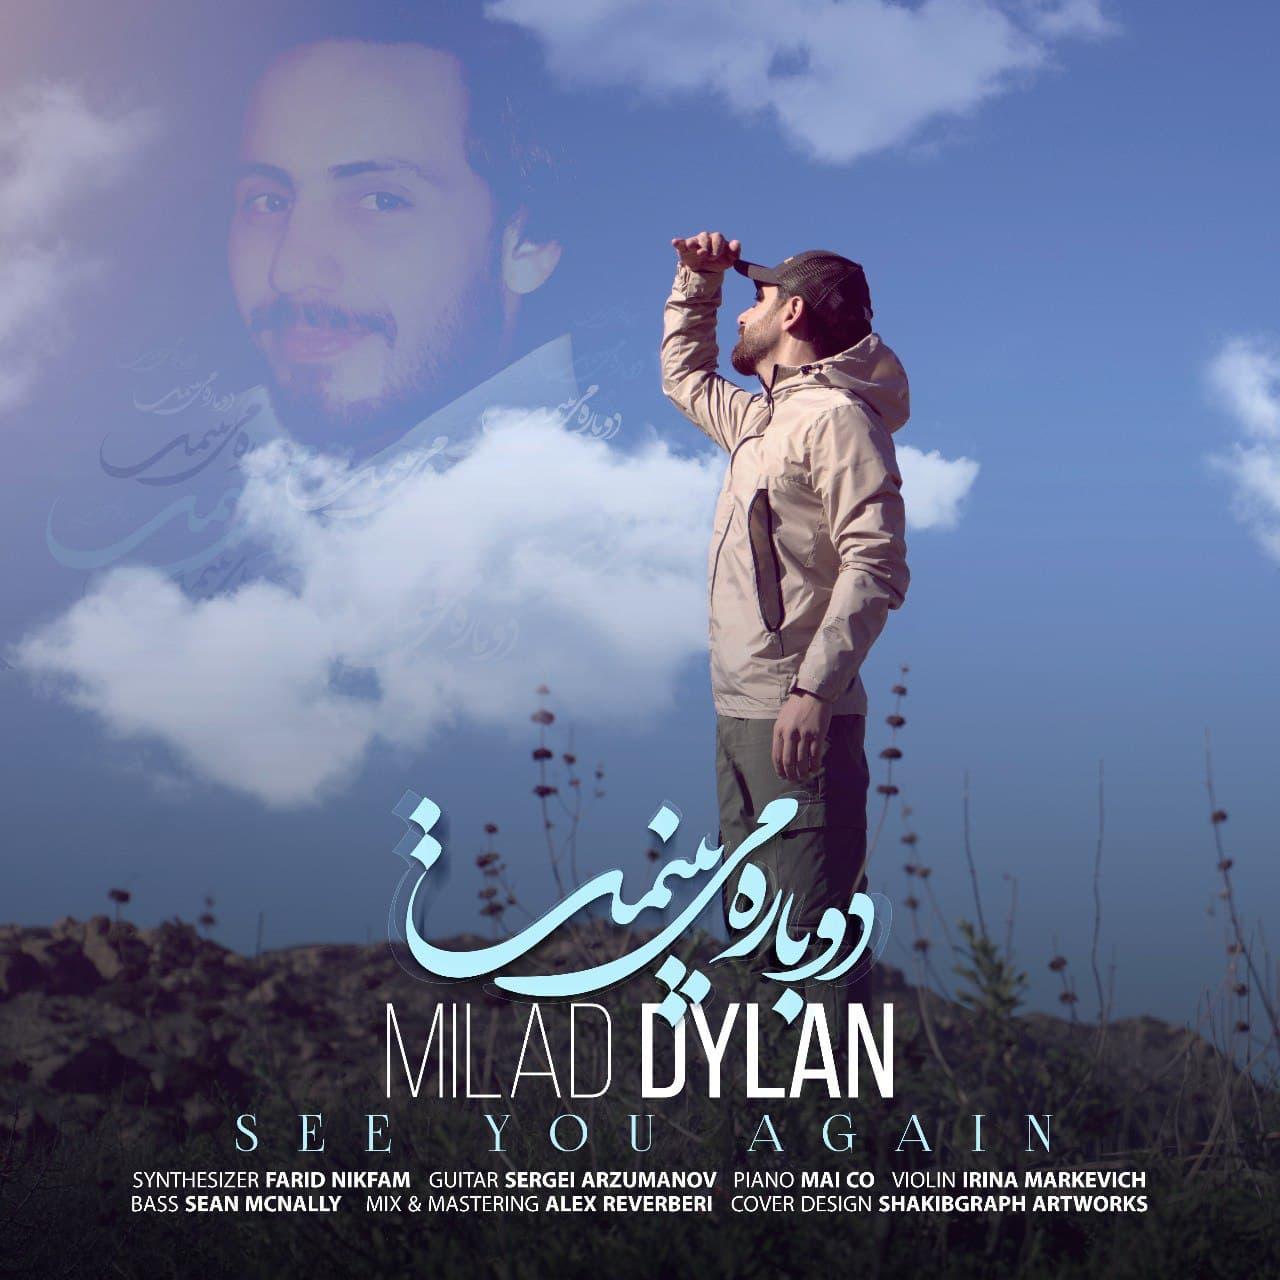 Milad Dylan – See You Again